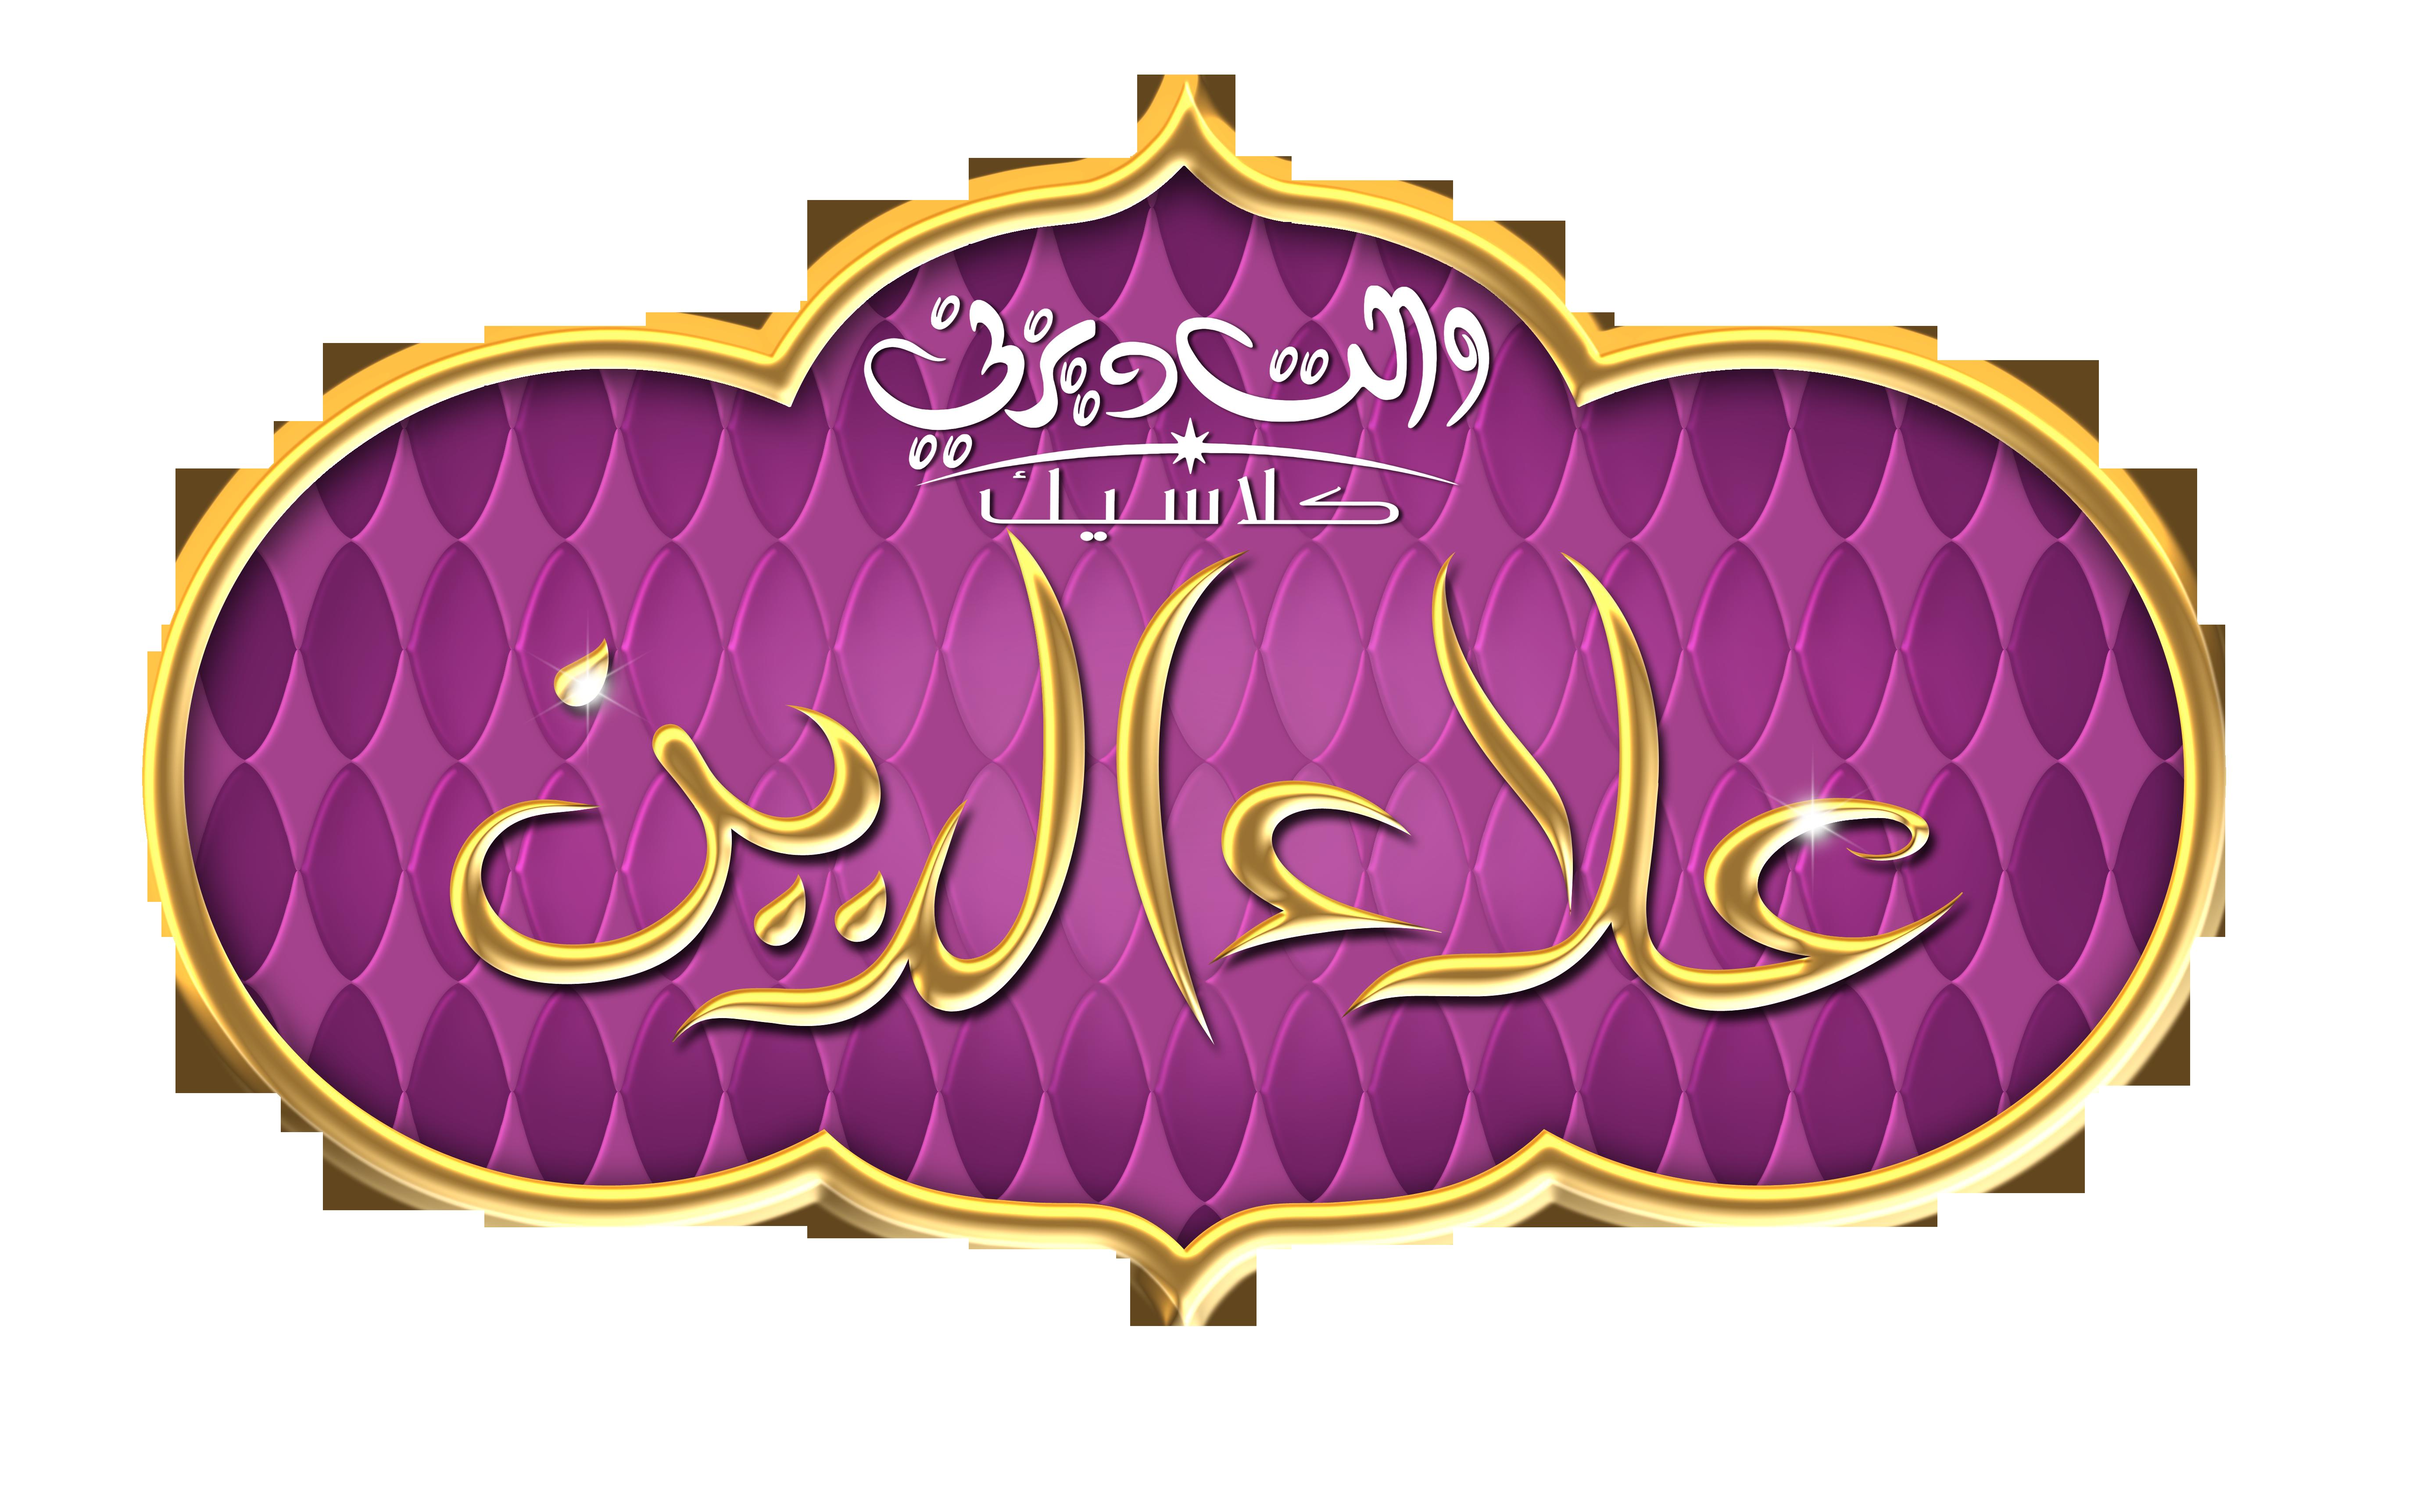 Walt disney Logos - aladdín (Arabic Version)